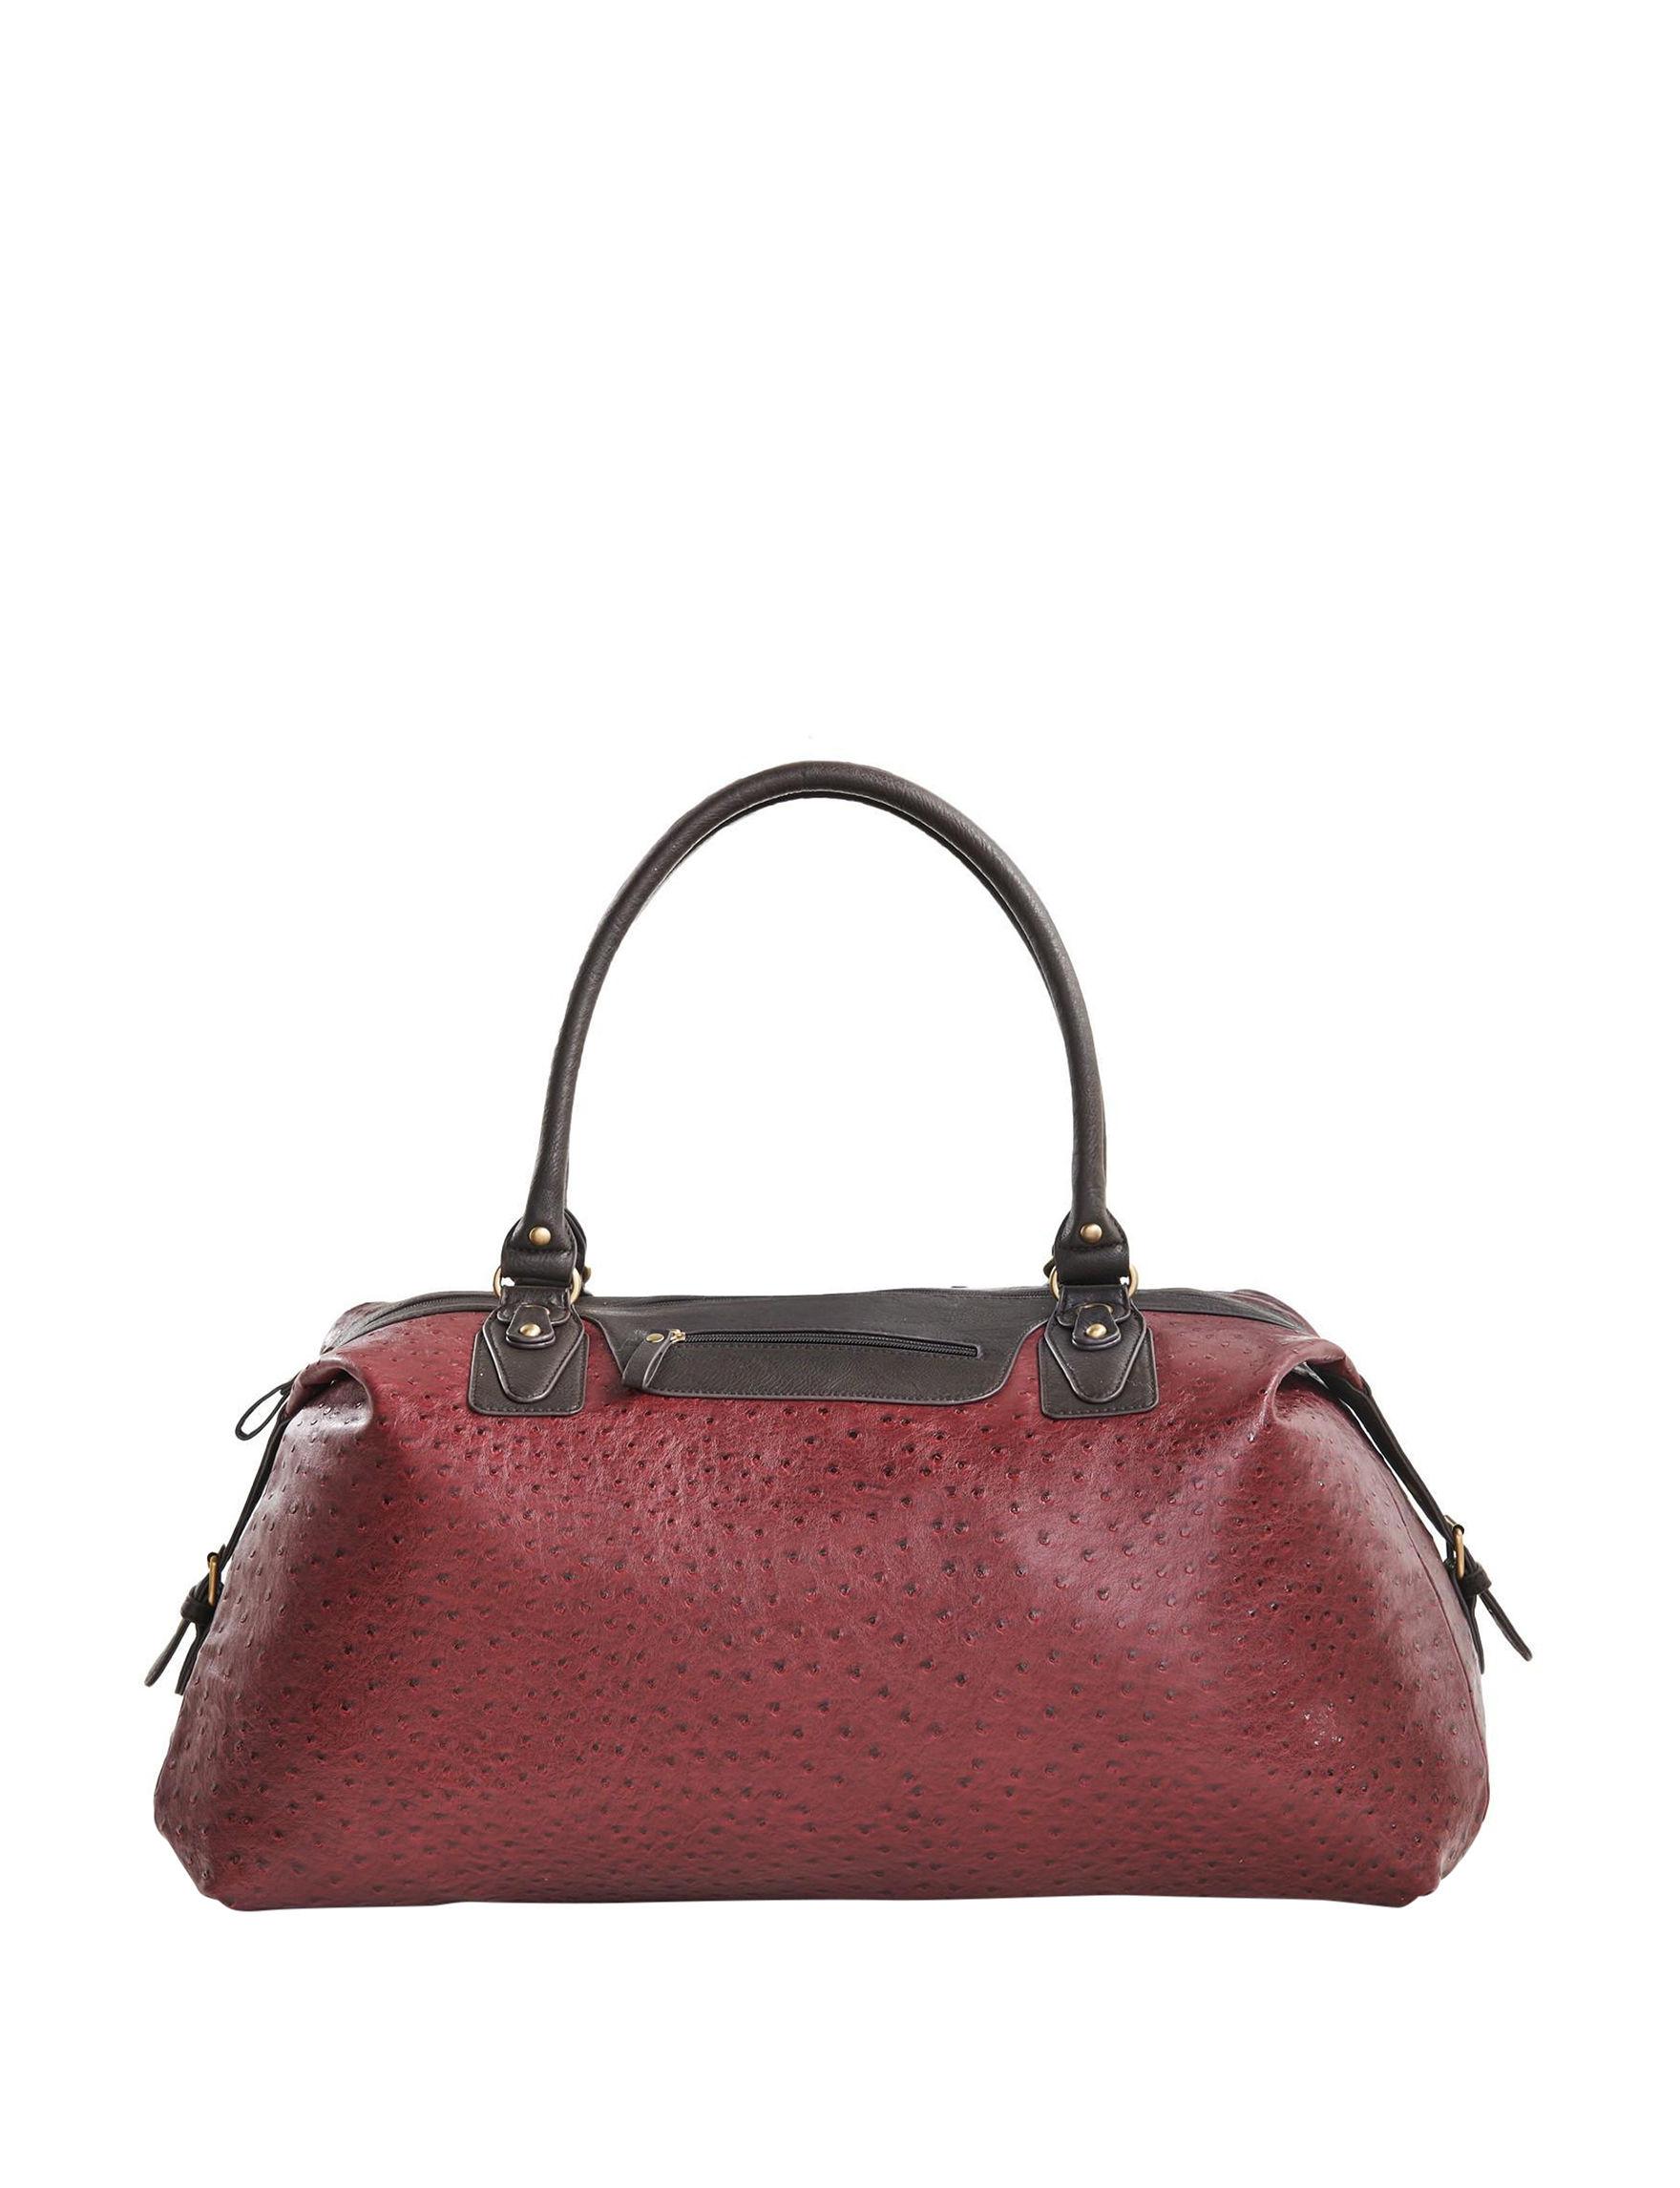 Bueno Berry Weekend Bags